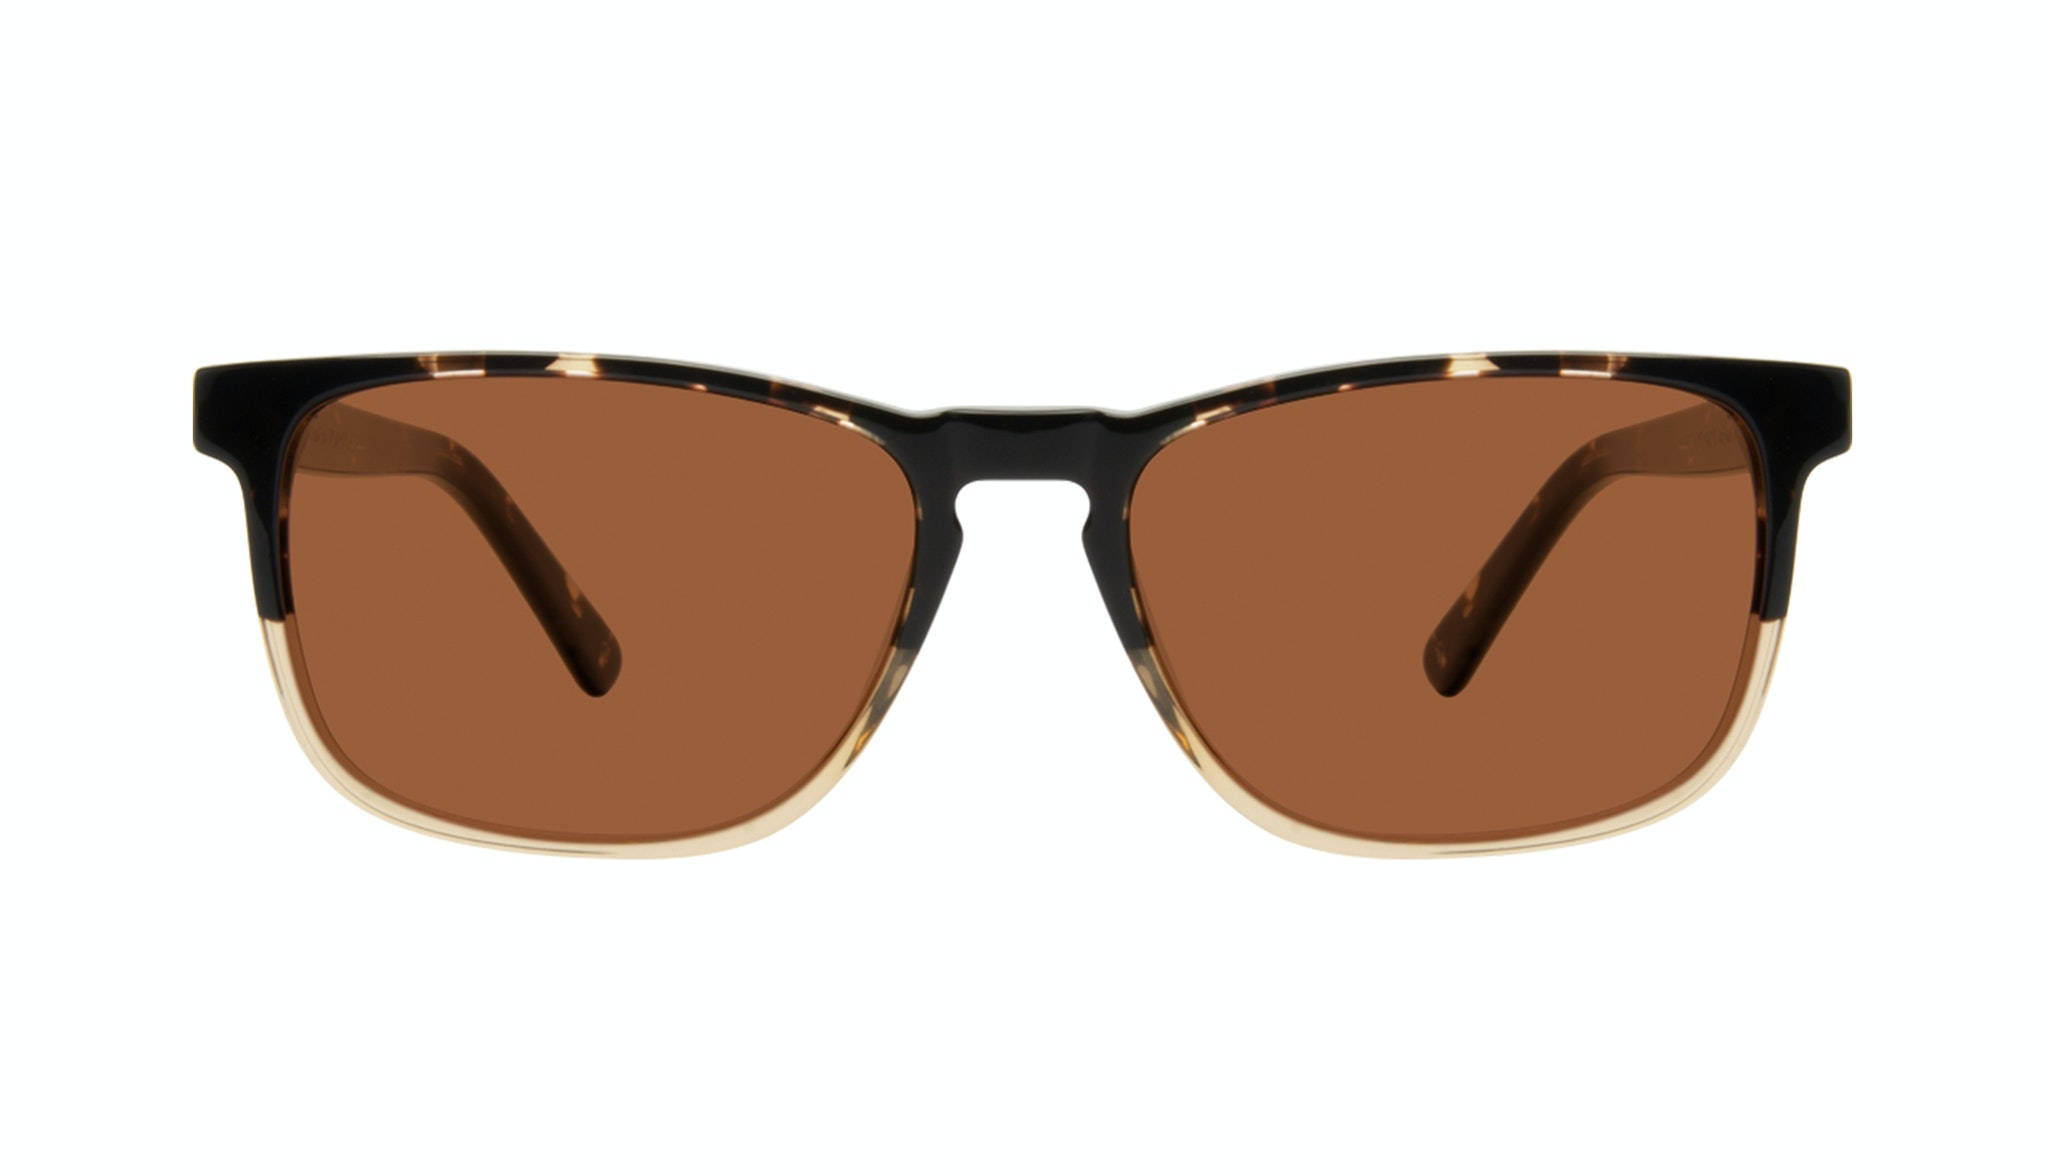 Affordable Fashion Glasses Rectangle Sunglasses Men Loft Golden Tortoise